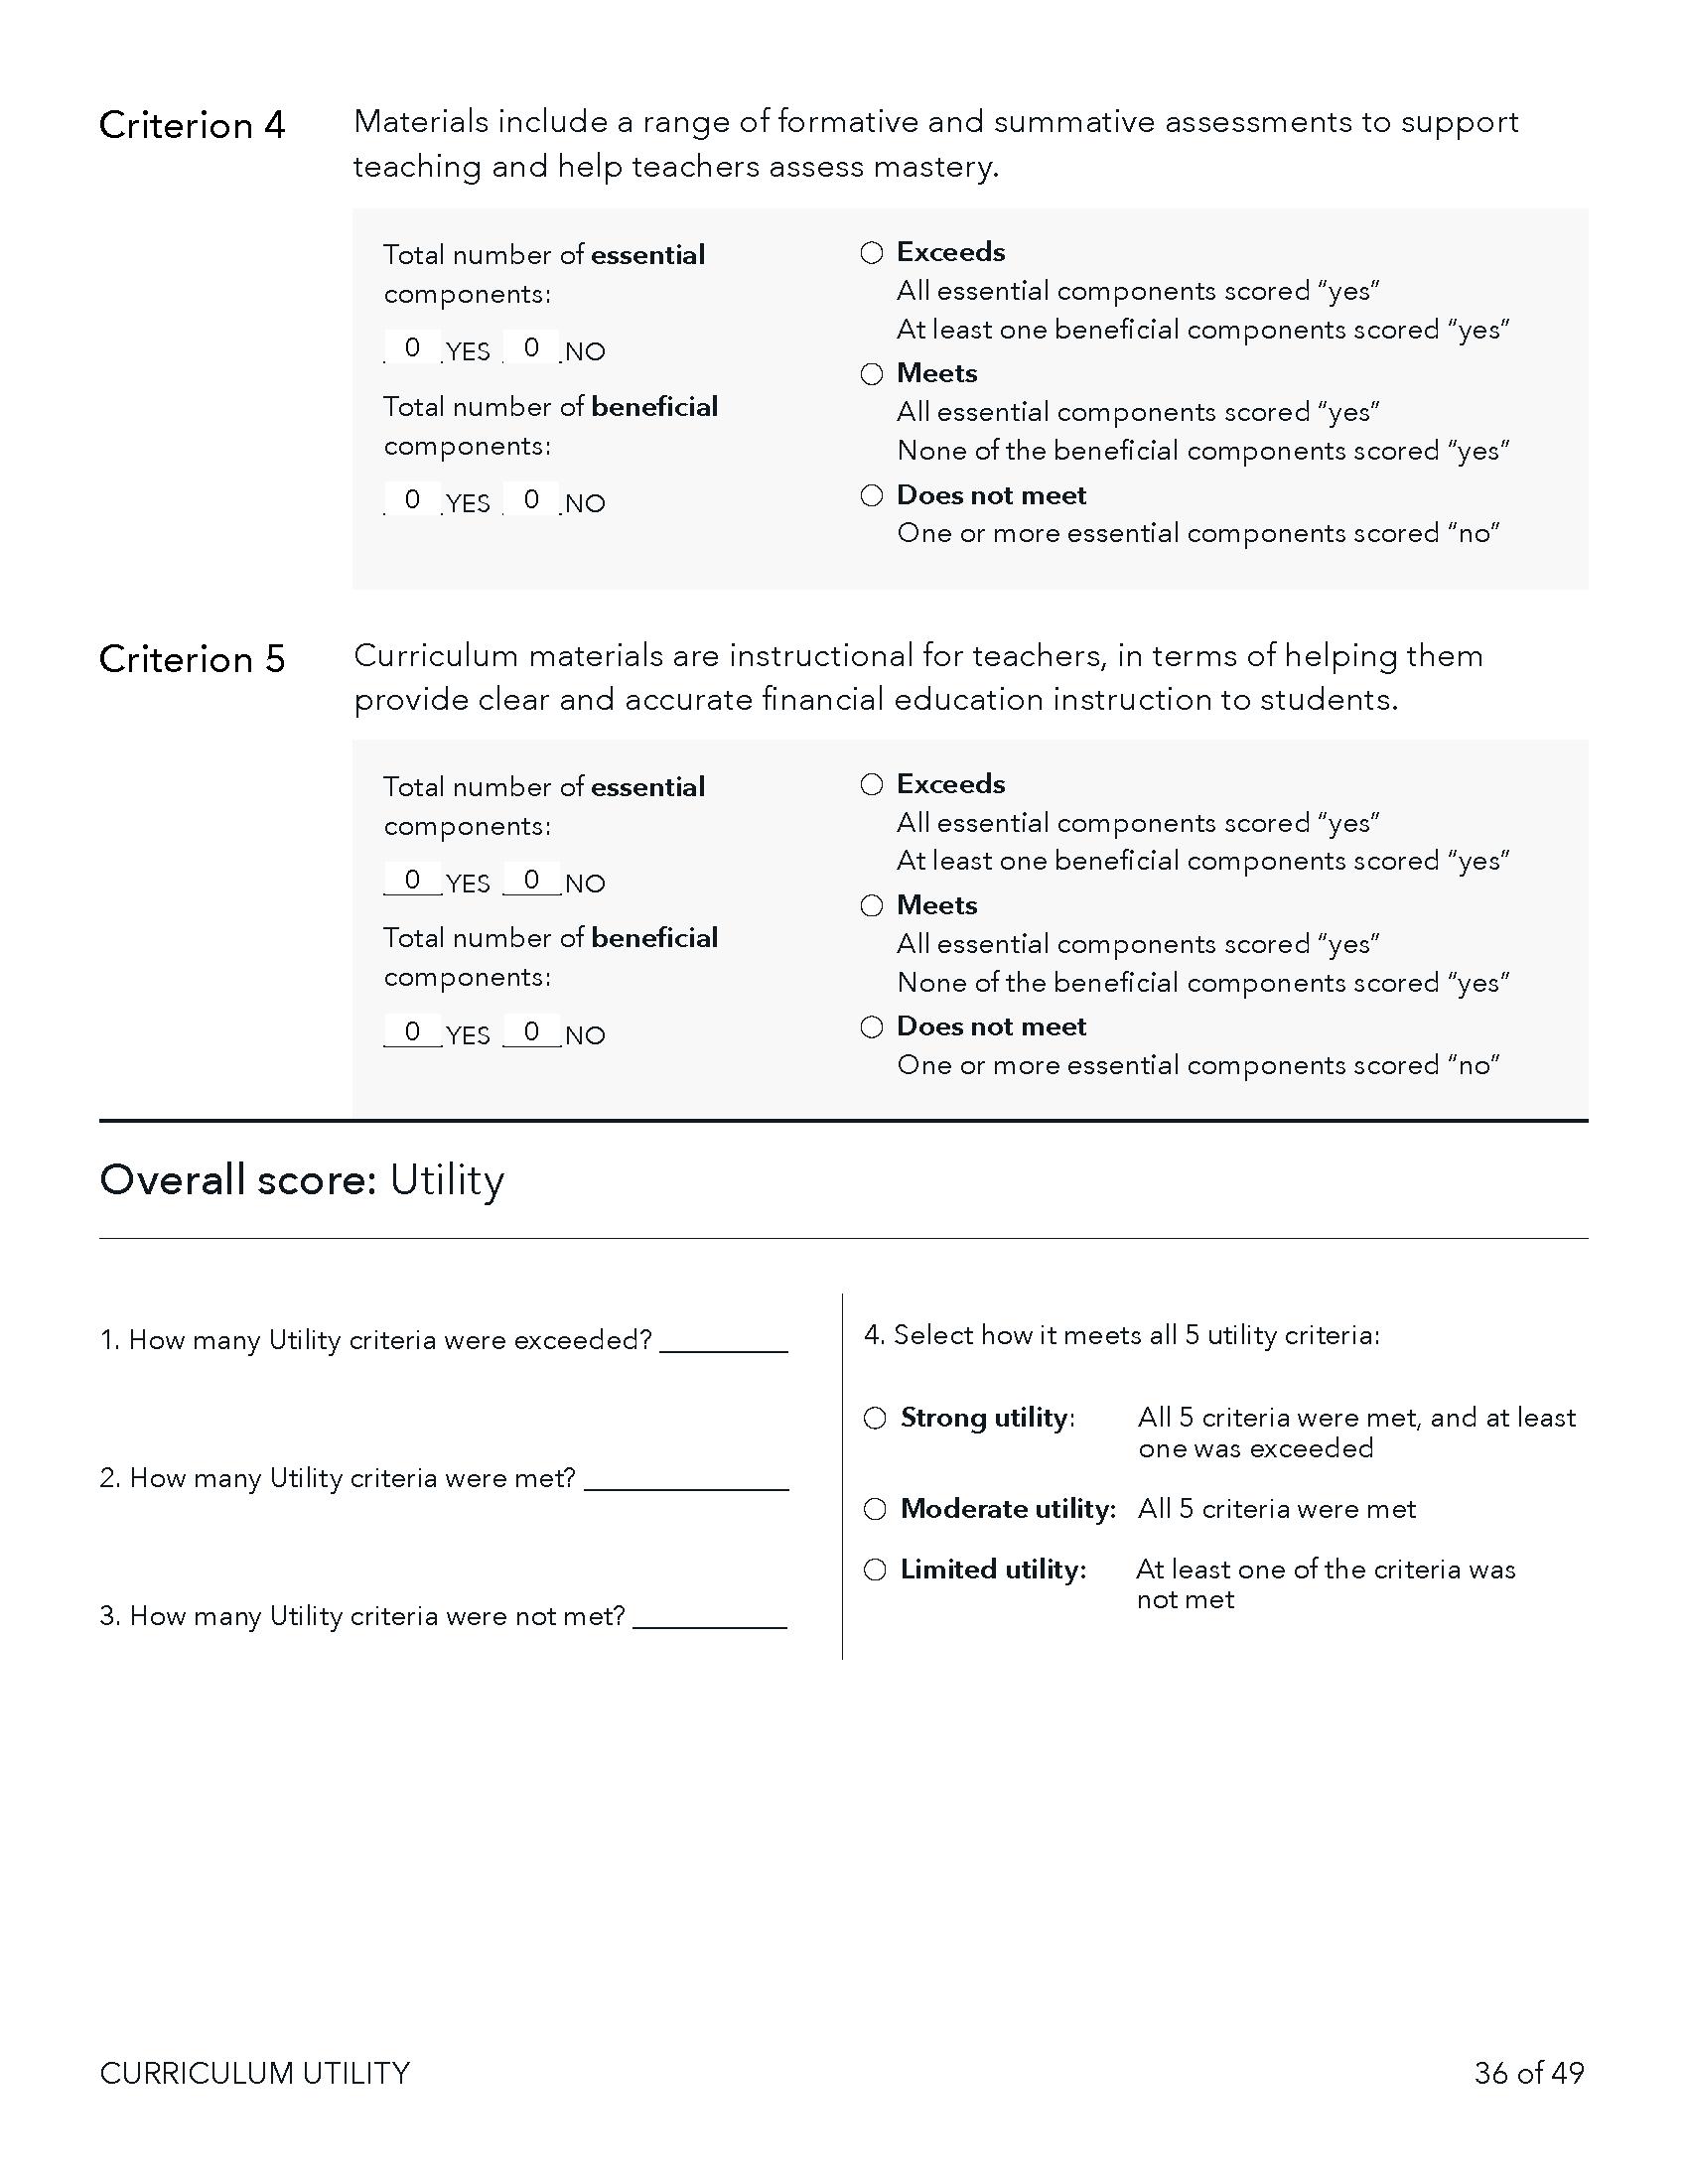 CRT utility scoring